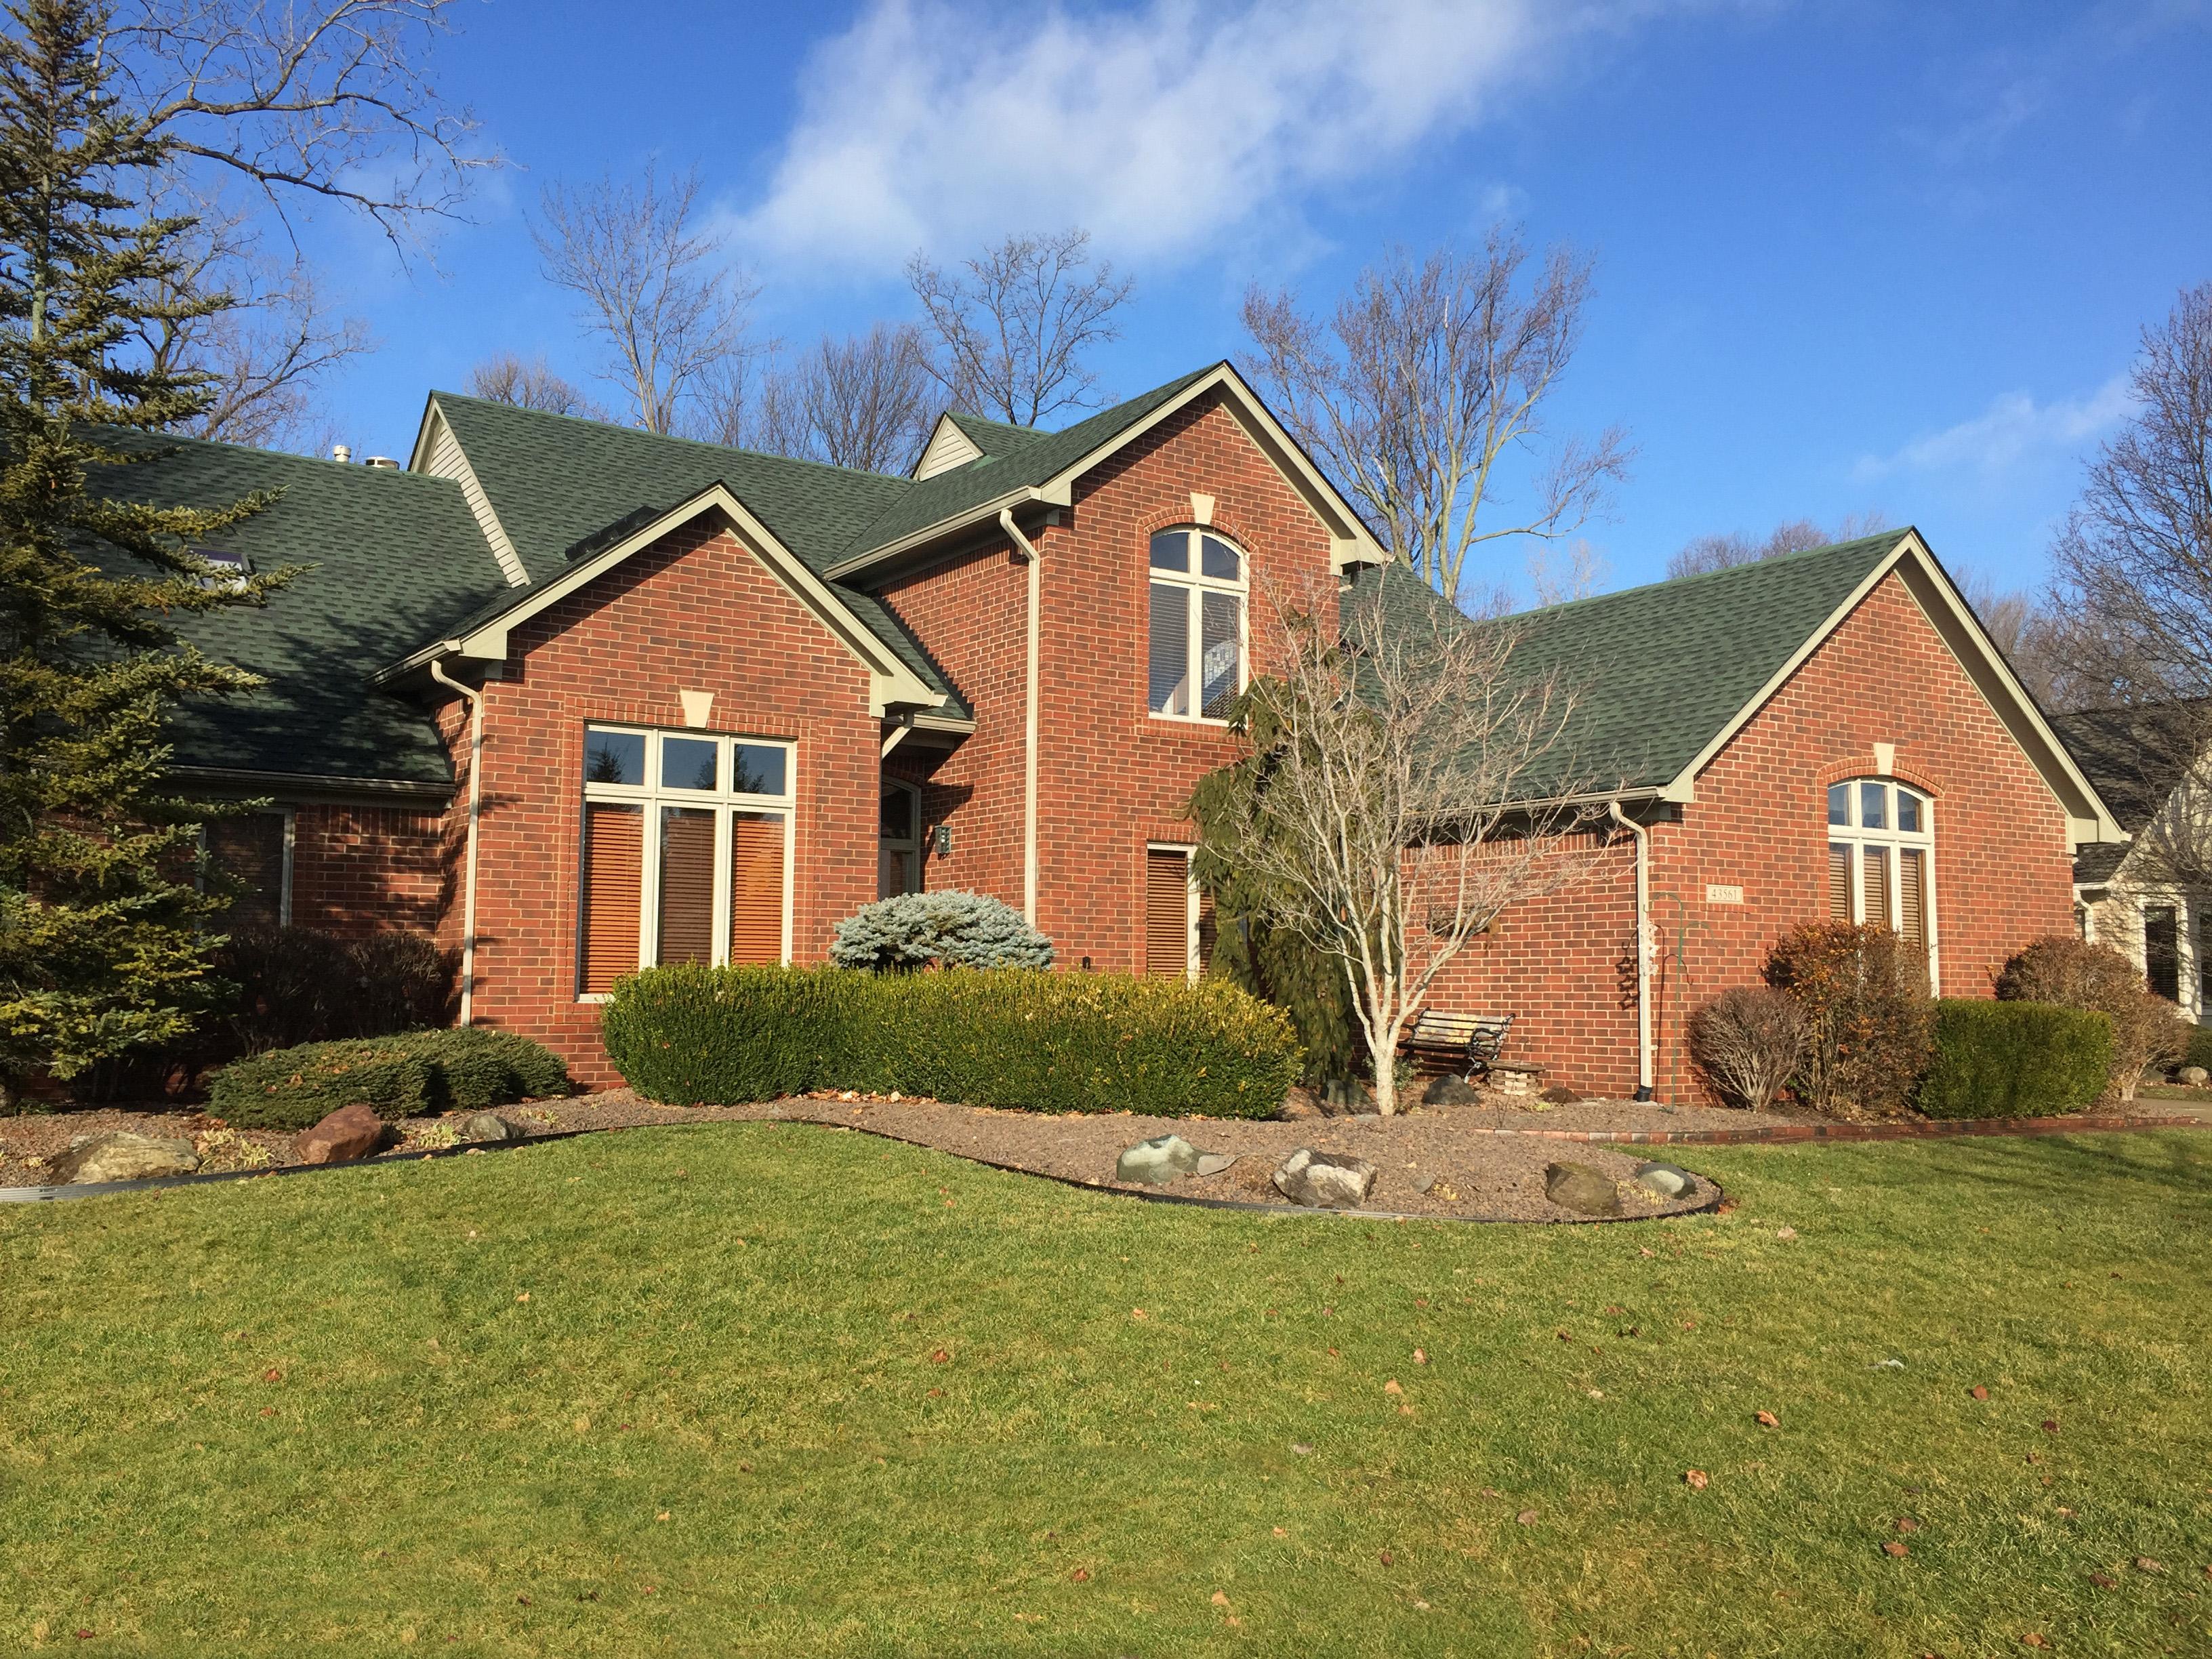 43561 Vintage Oaks, Sterling Heights, Michigan 48314